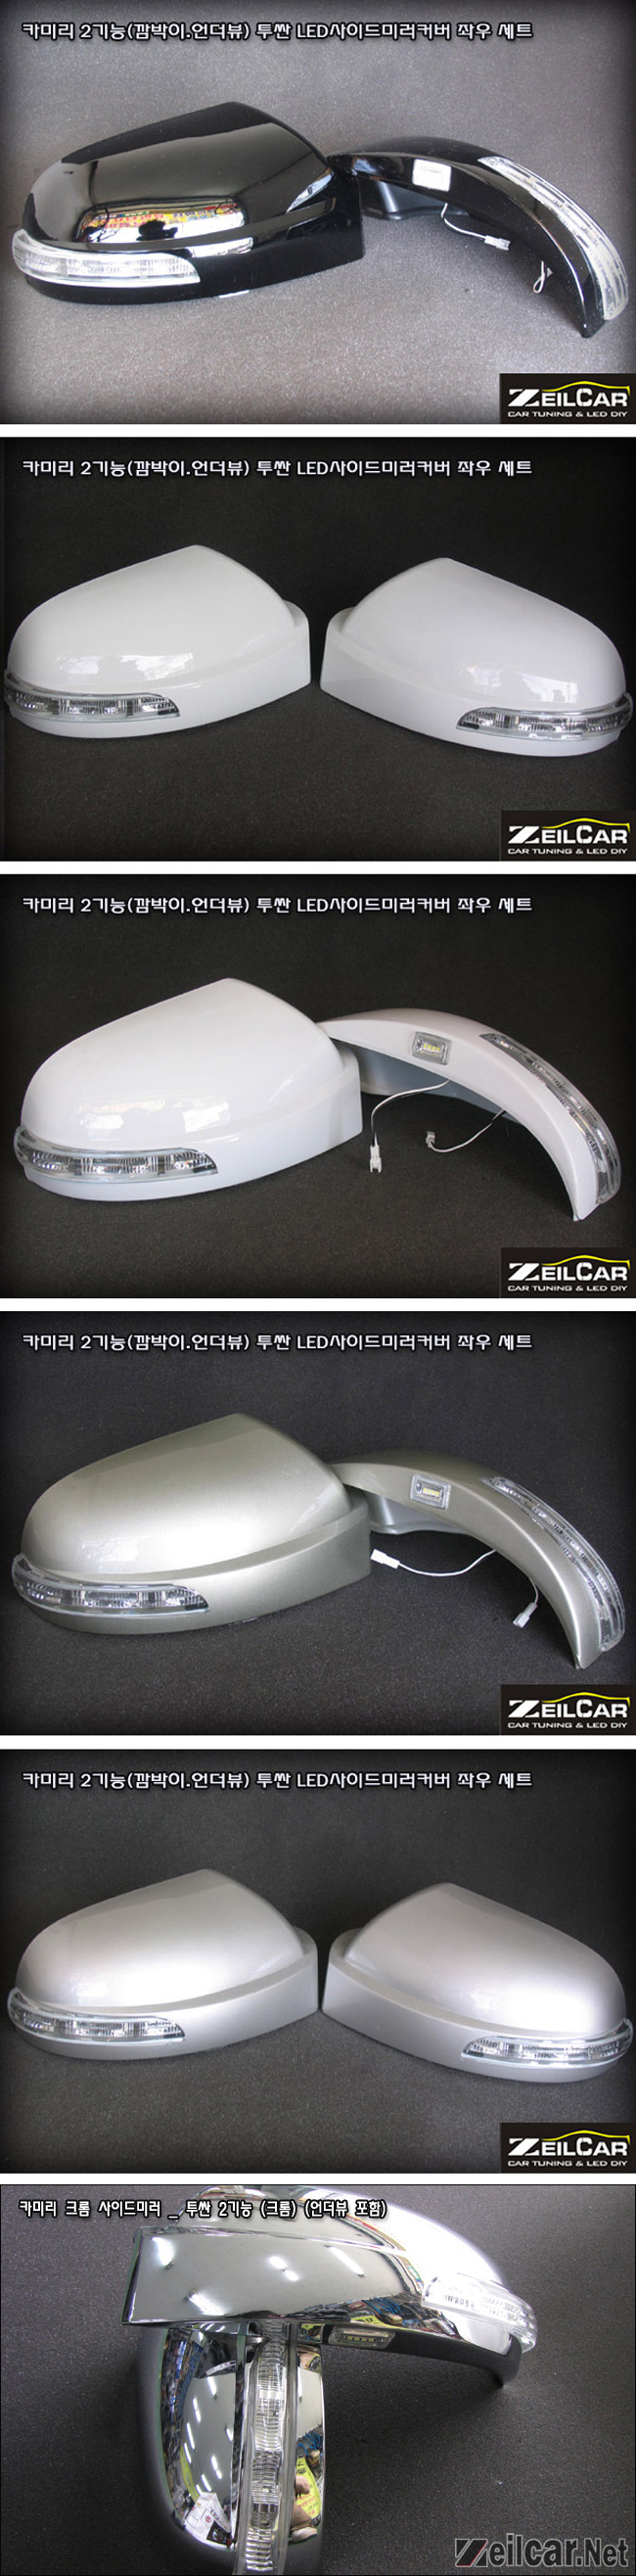 LED 사이드미러 커버, DIY키트